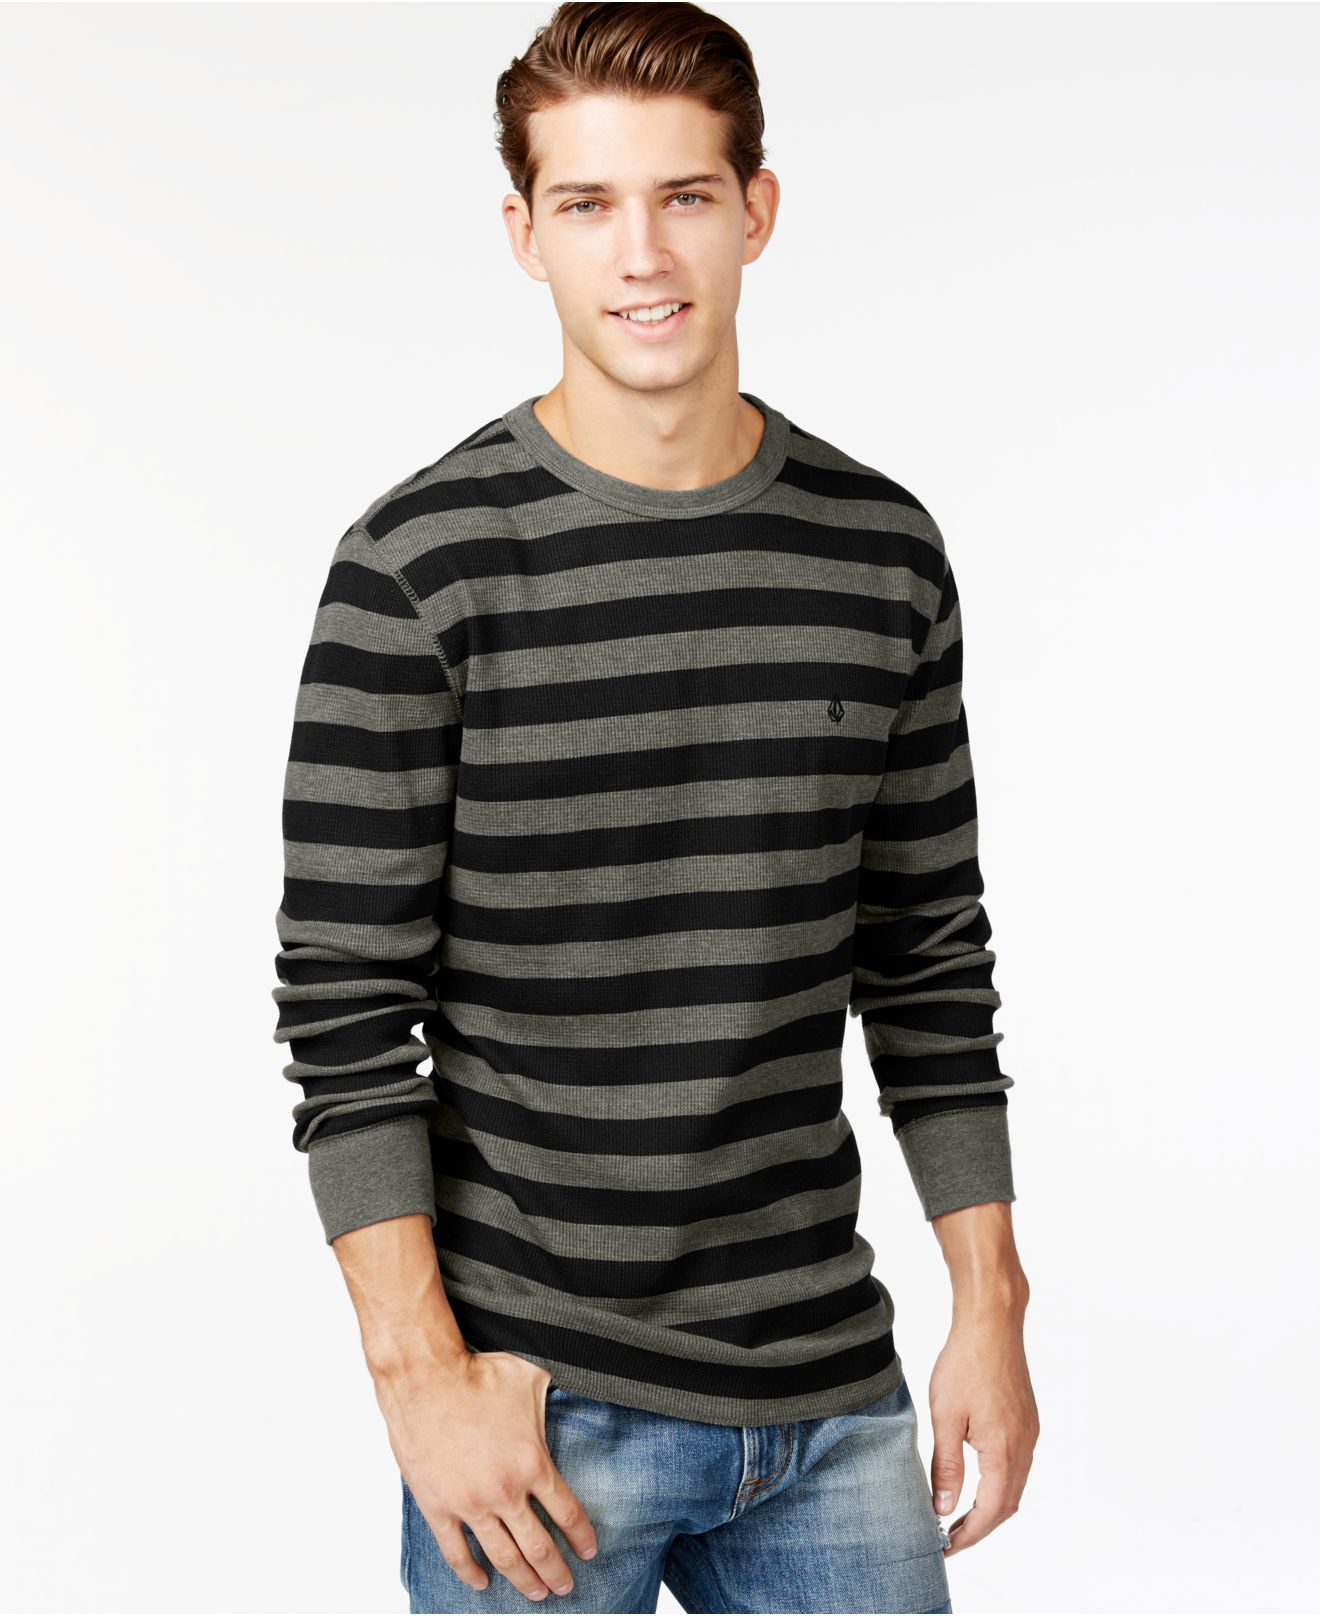 Volcom Royceeo Stripe Thermal Long Sleeve T Shirt In Gray